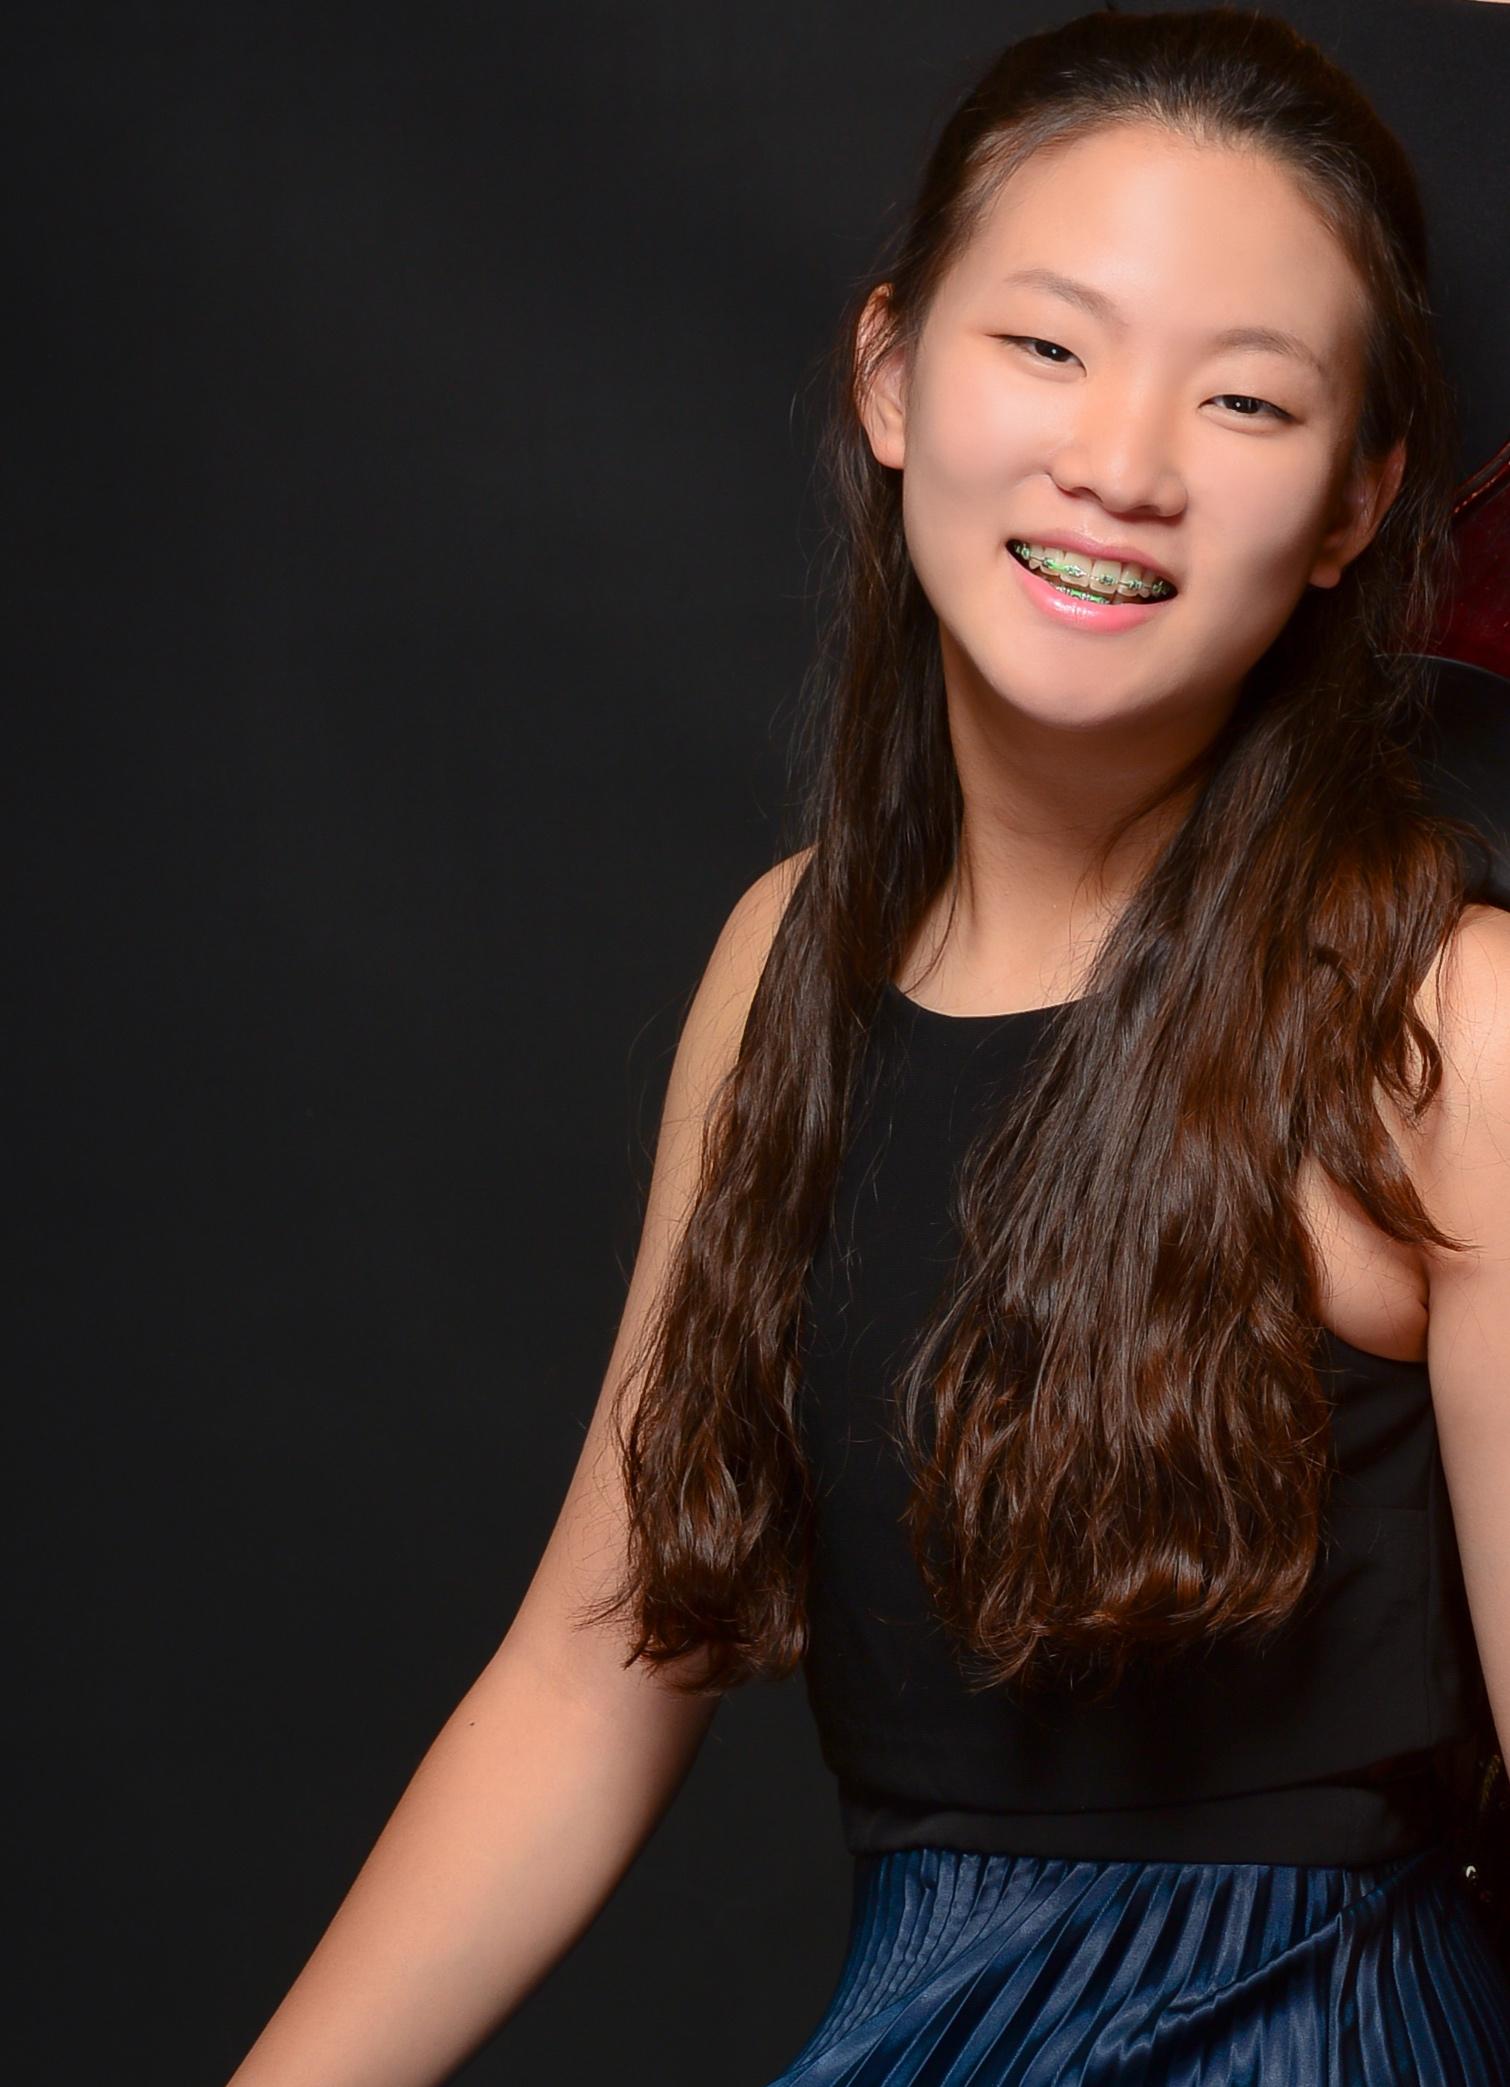 Ashley Kim Age 17 Demarest, NJ